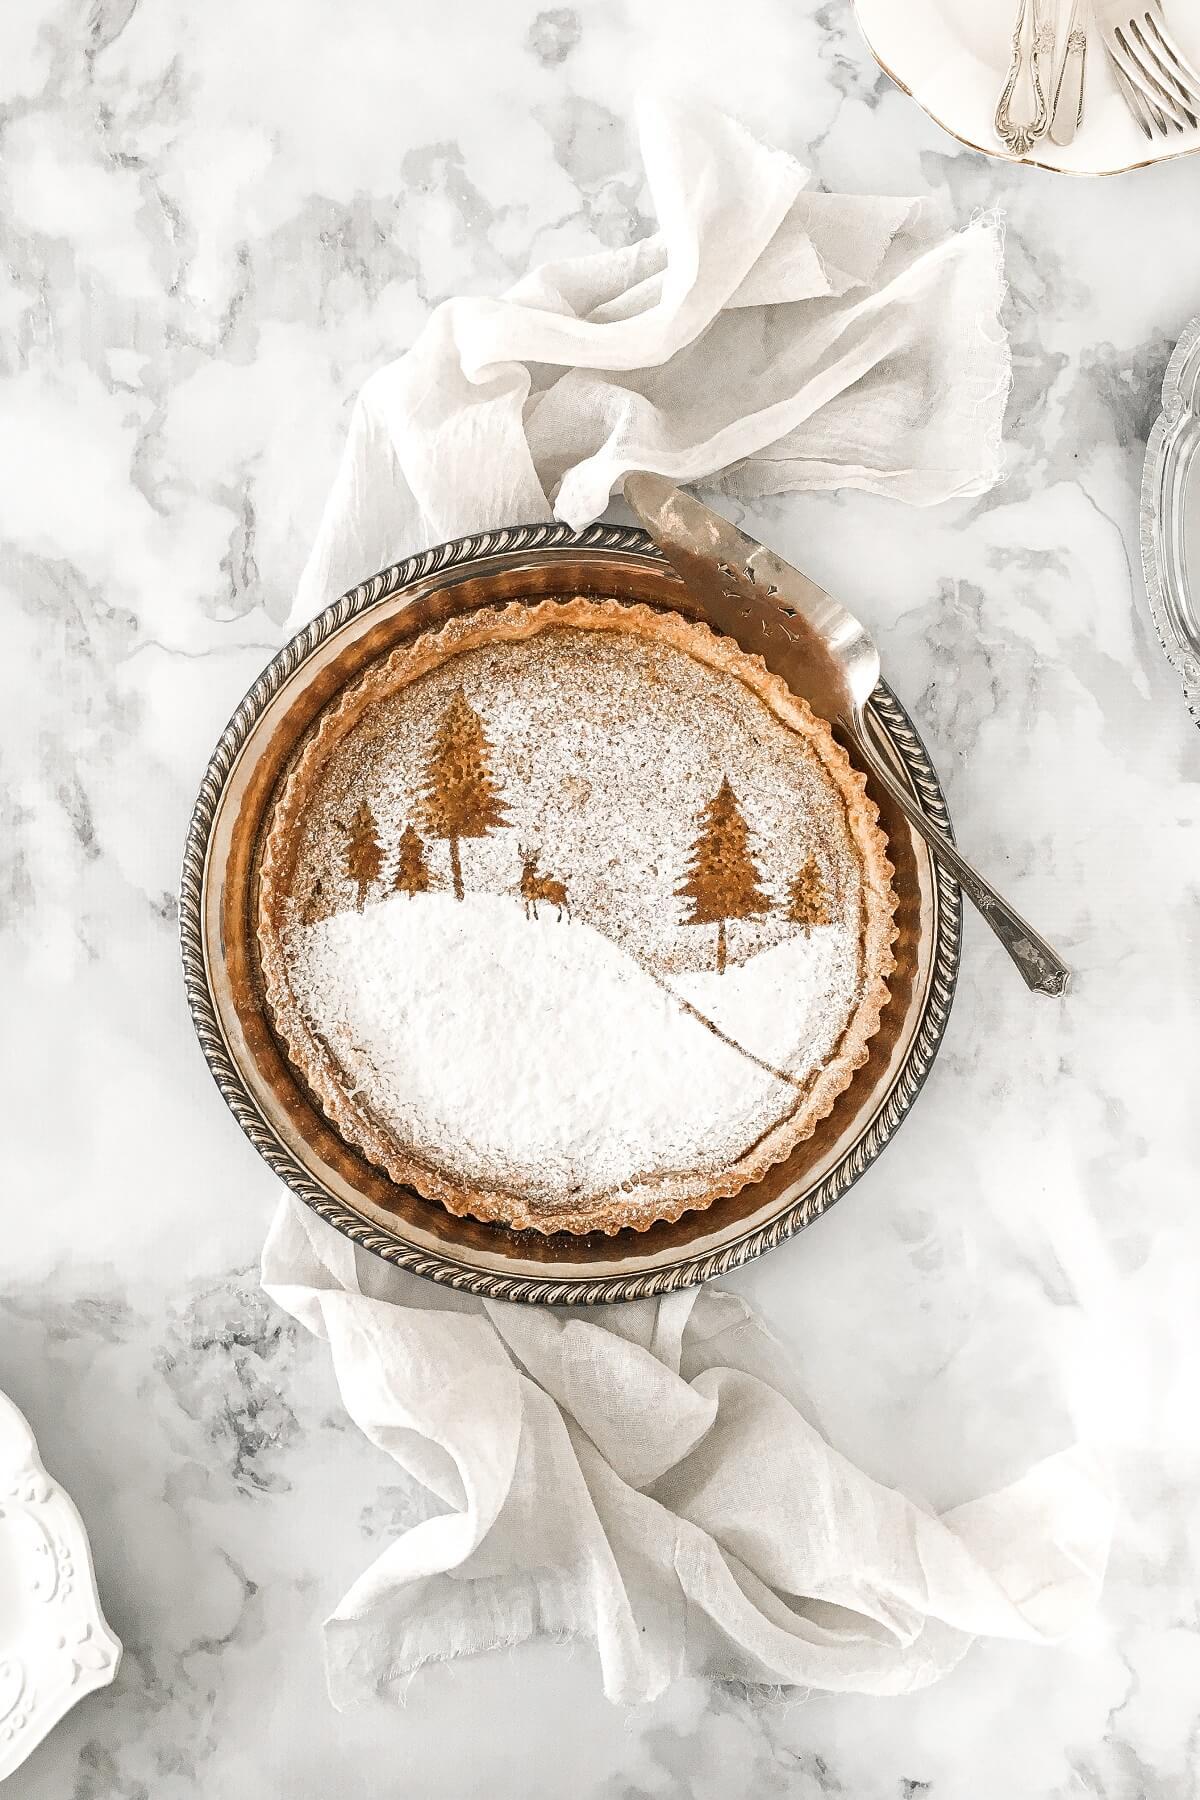 Maple tart with a powdered sugar stencil of a snowy winter scene.